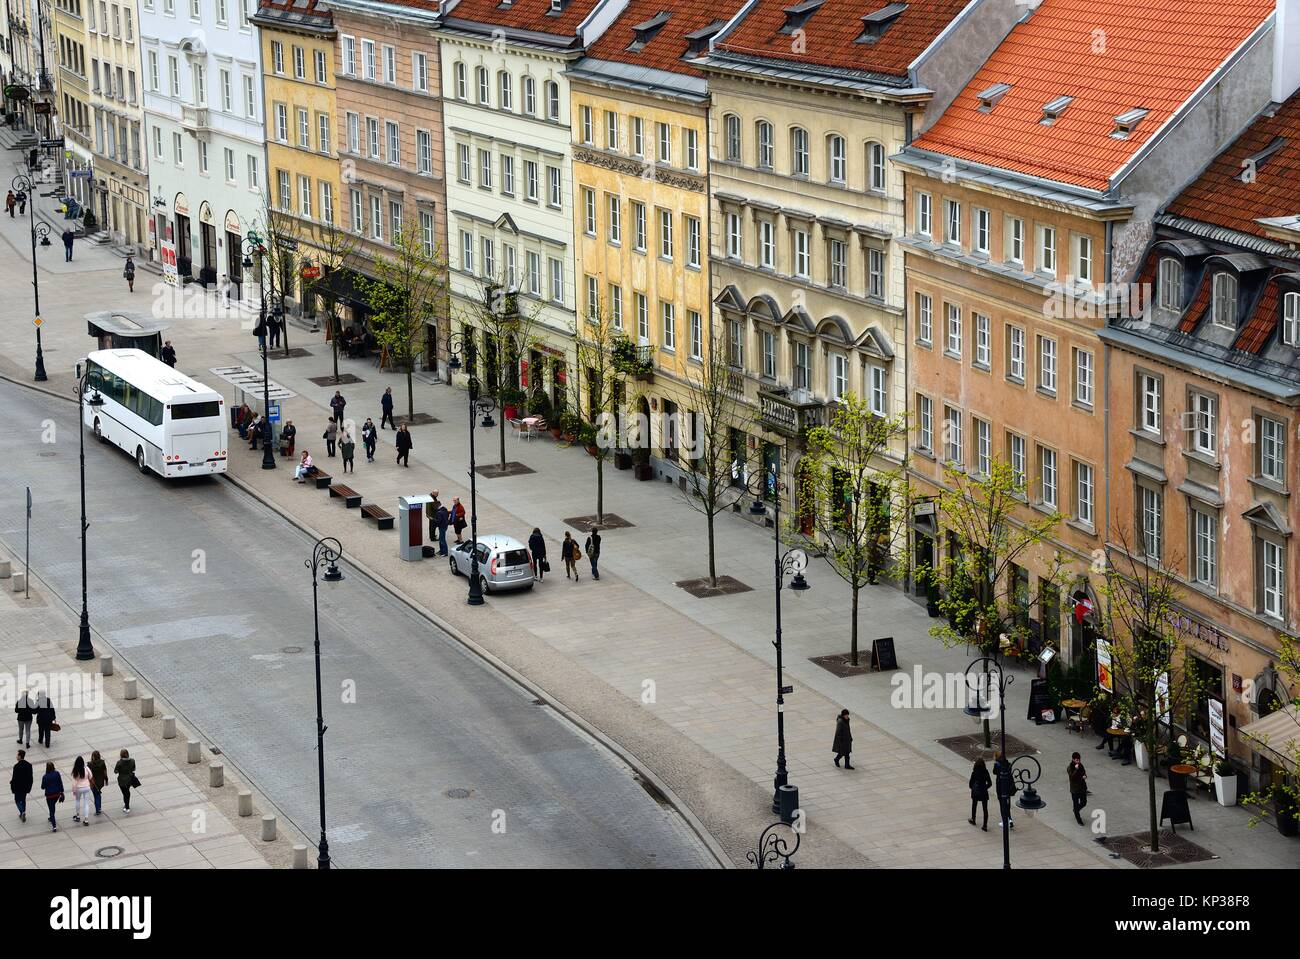 Krakowskie Przedmiescie street - so called Royal Tract, Warsaw, Poland, Europe - Stock Image